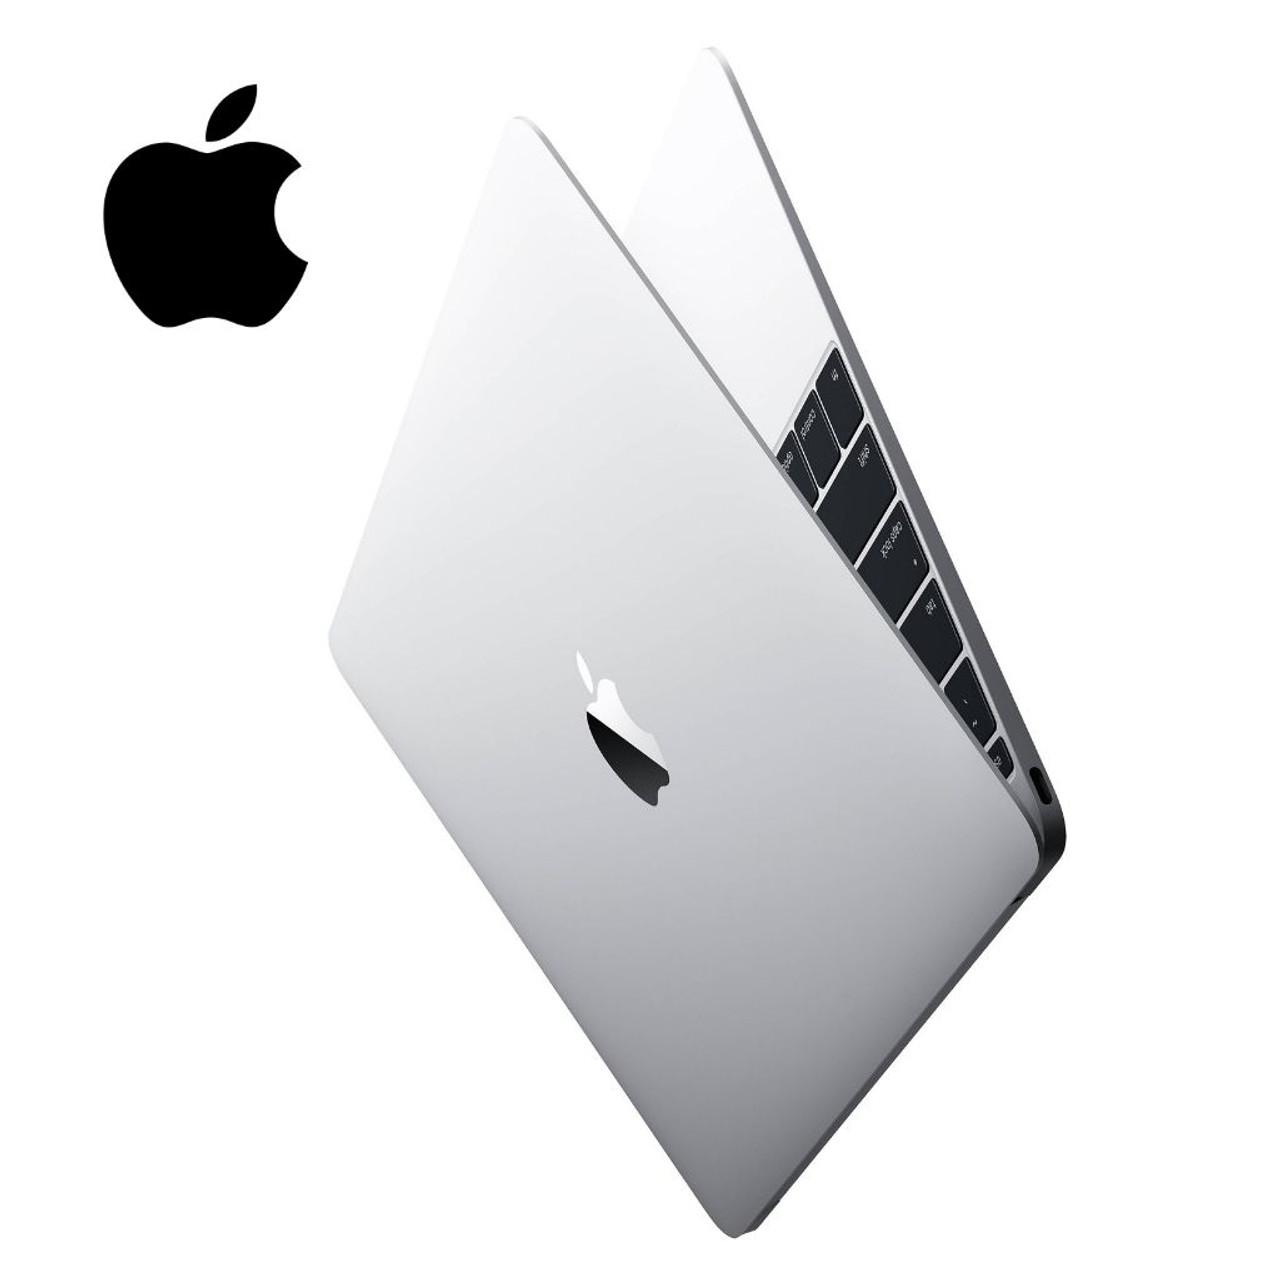 Apple Macbook: 12-Inch Retina Display (Refurbished)! 9.99 (REG ,699.99) + Free Shipping at Until Gone!